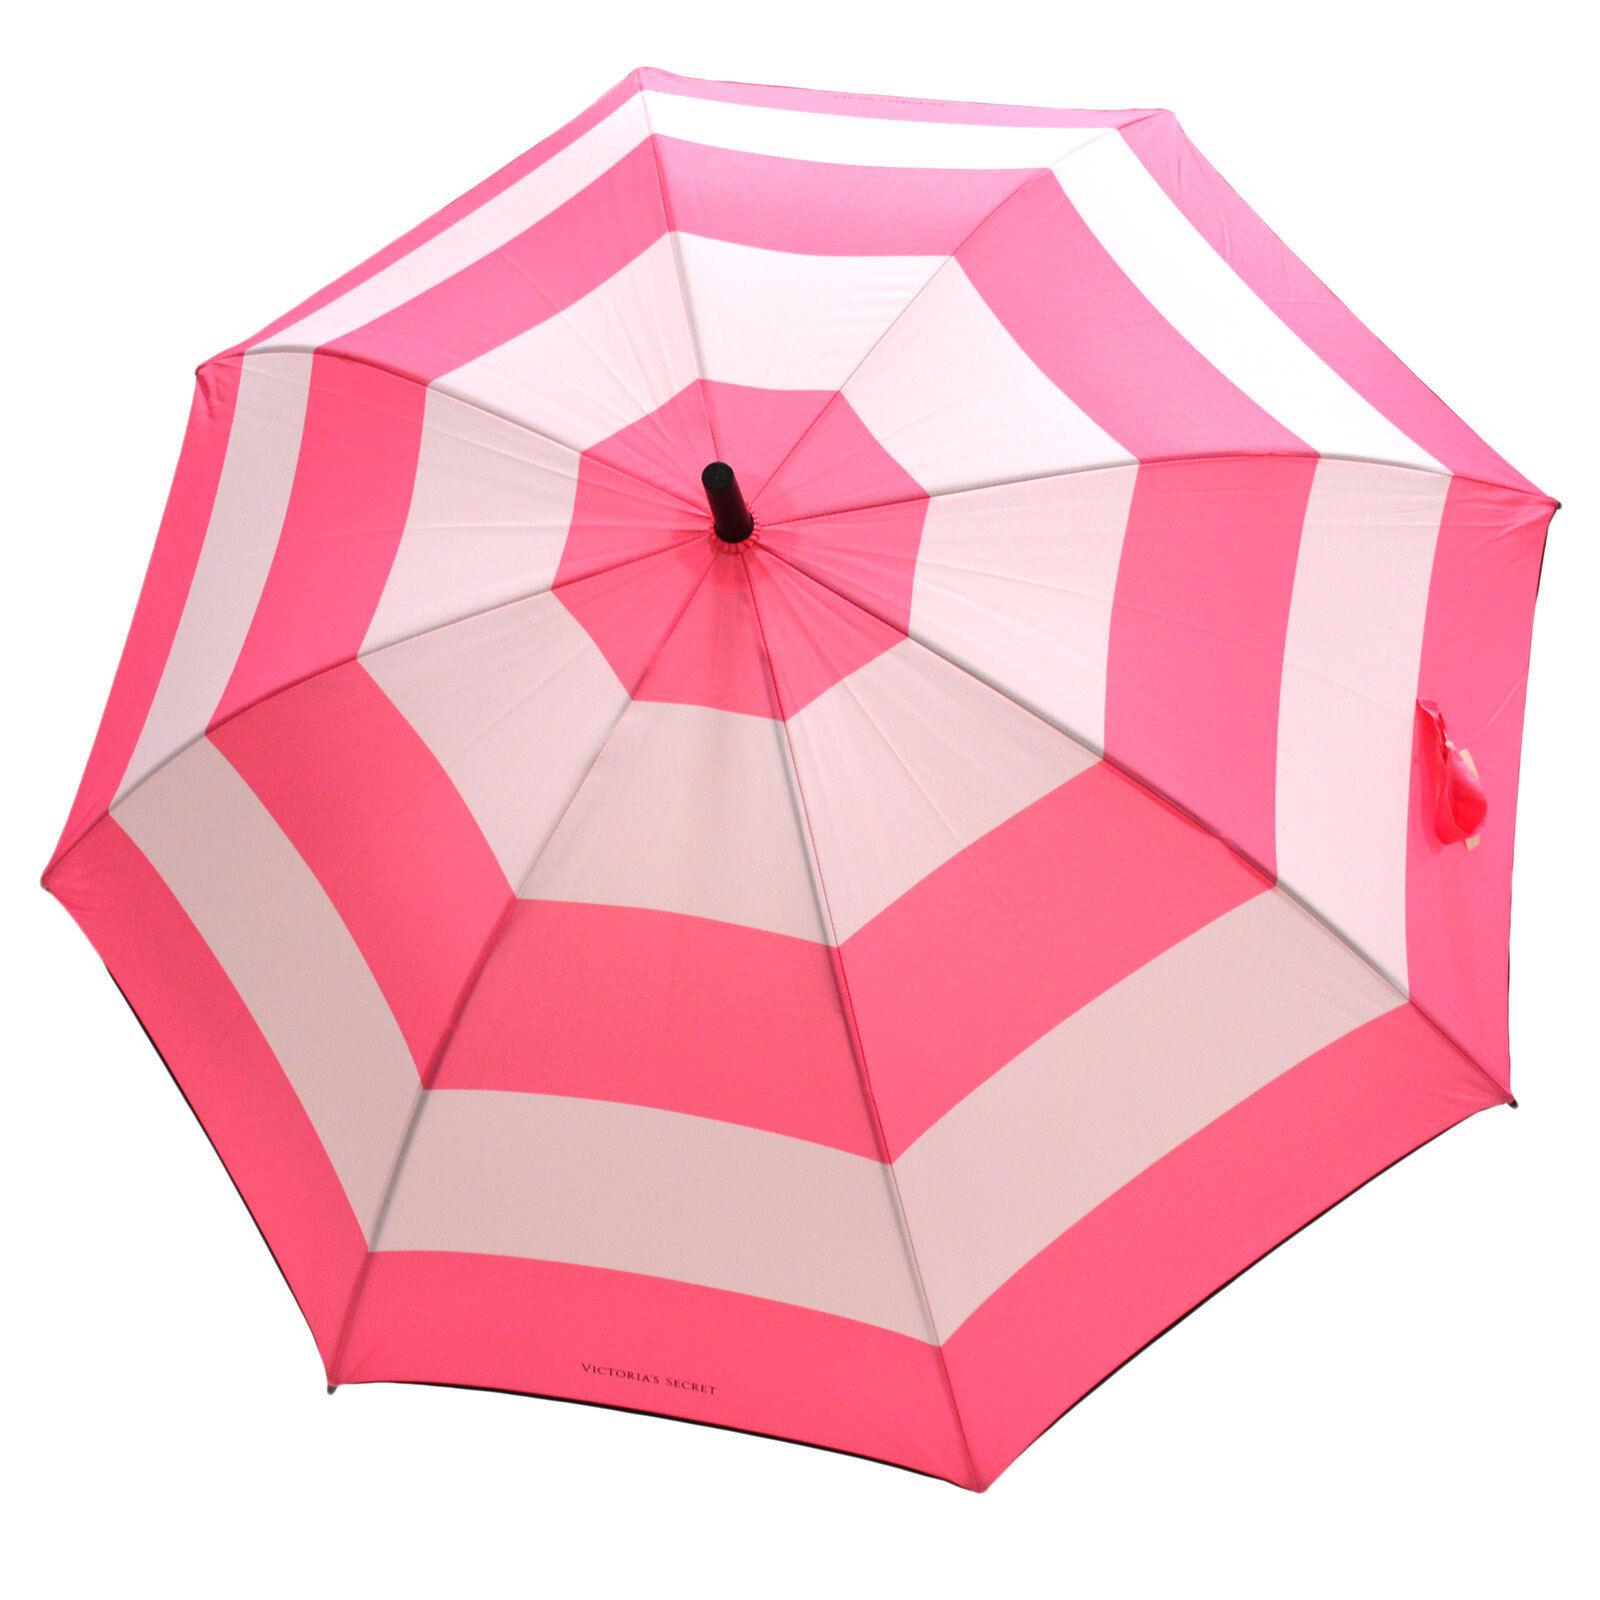 Victoria's Secret Umbrella Pink Signature Stripe Limited ...